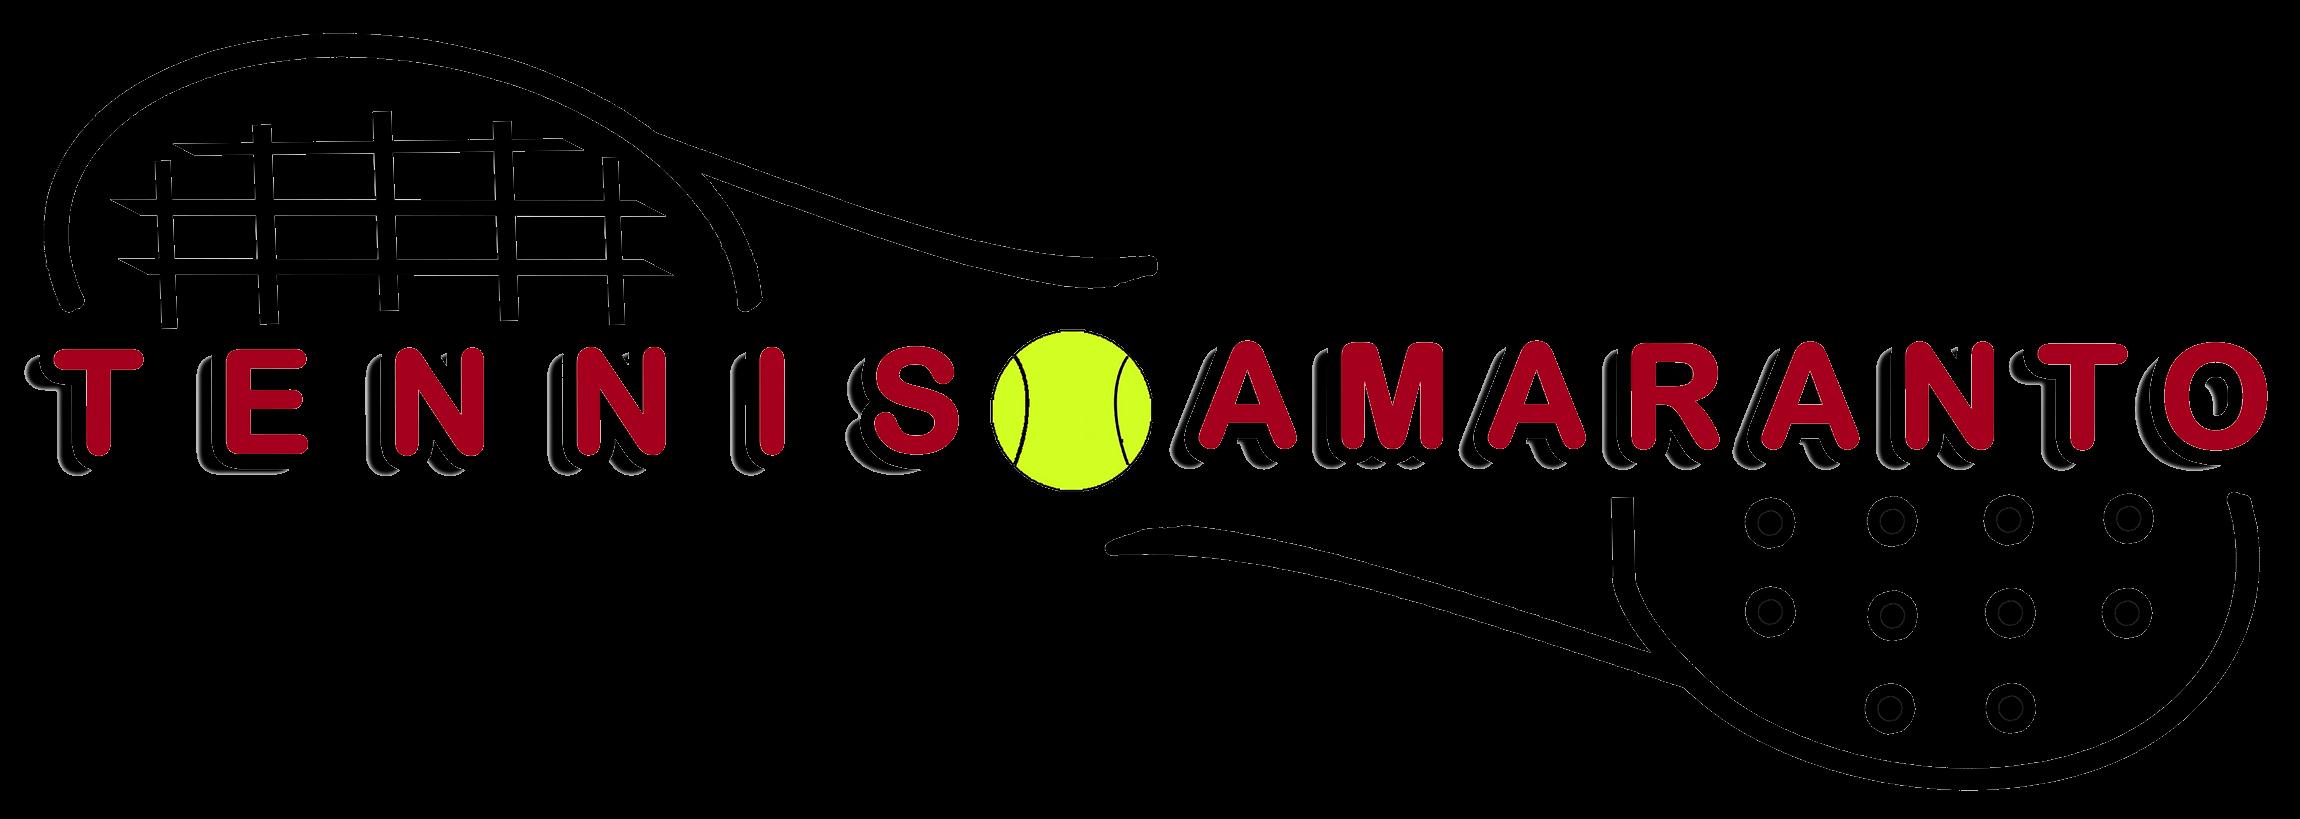 Tennis Amaranto